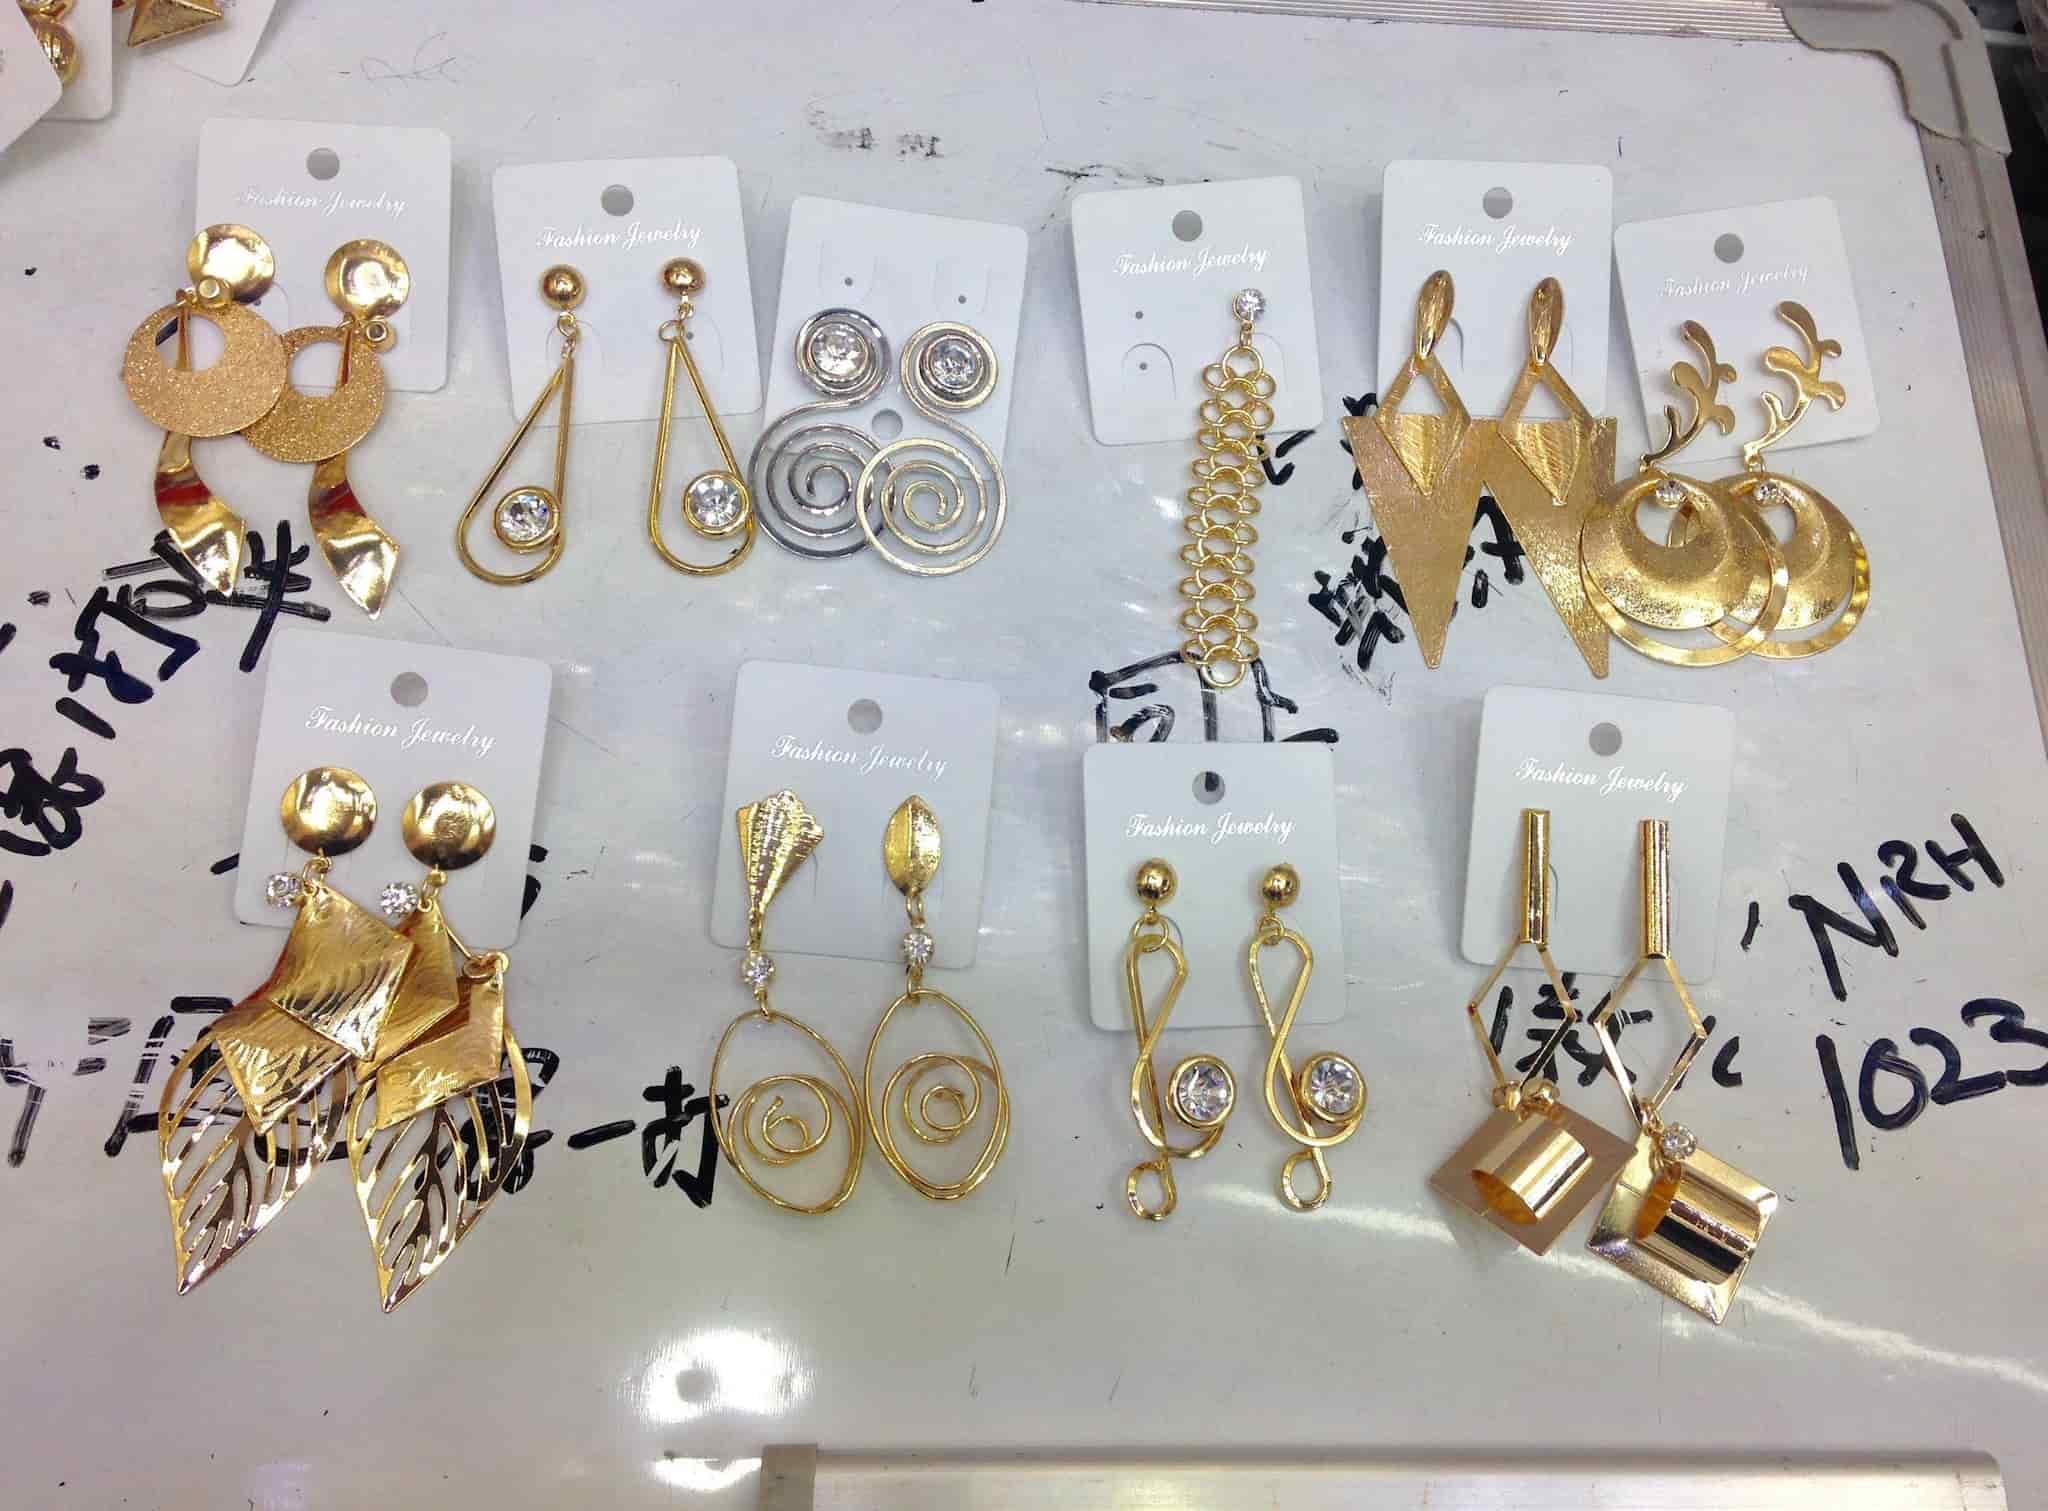 Star Jewellery, Sadar Bazar - Imitation Jewellery Retailers